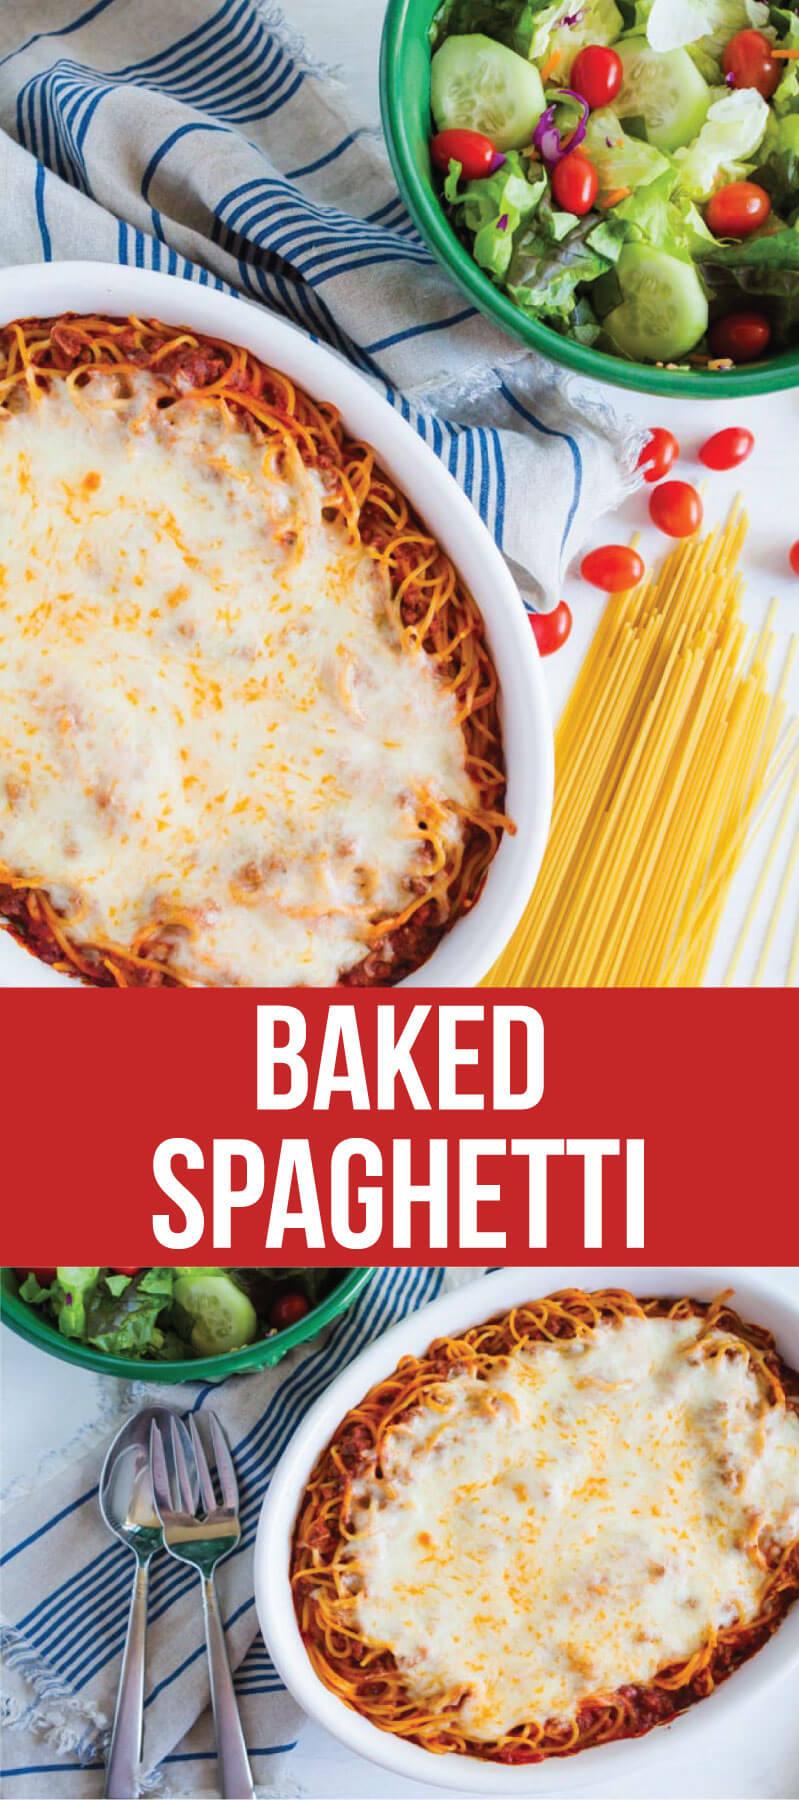 Baked Spaghetti - a family favorite dinner and the best way to eat spaghetti! thirtyhandmadedays.com